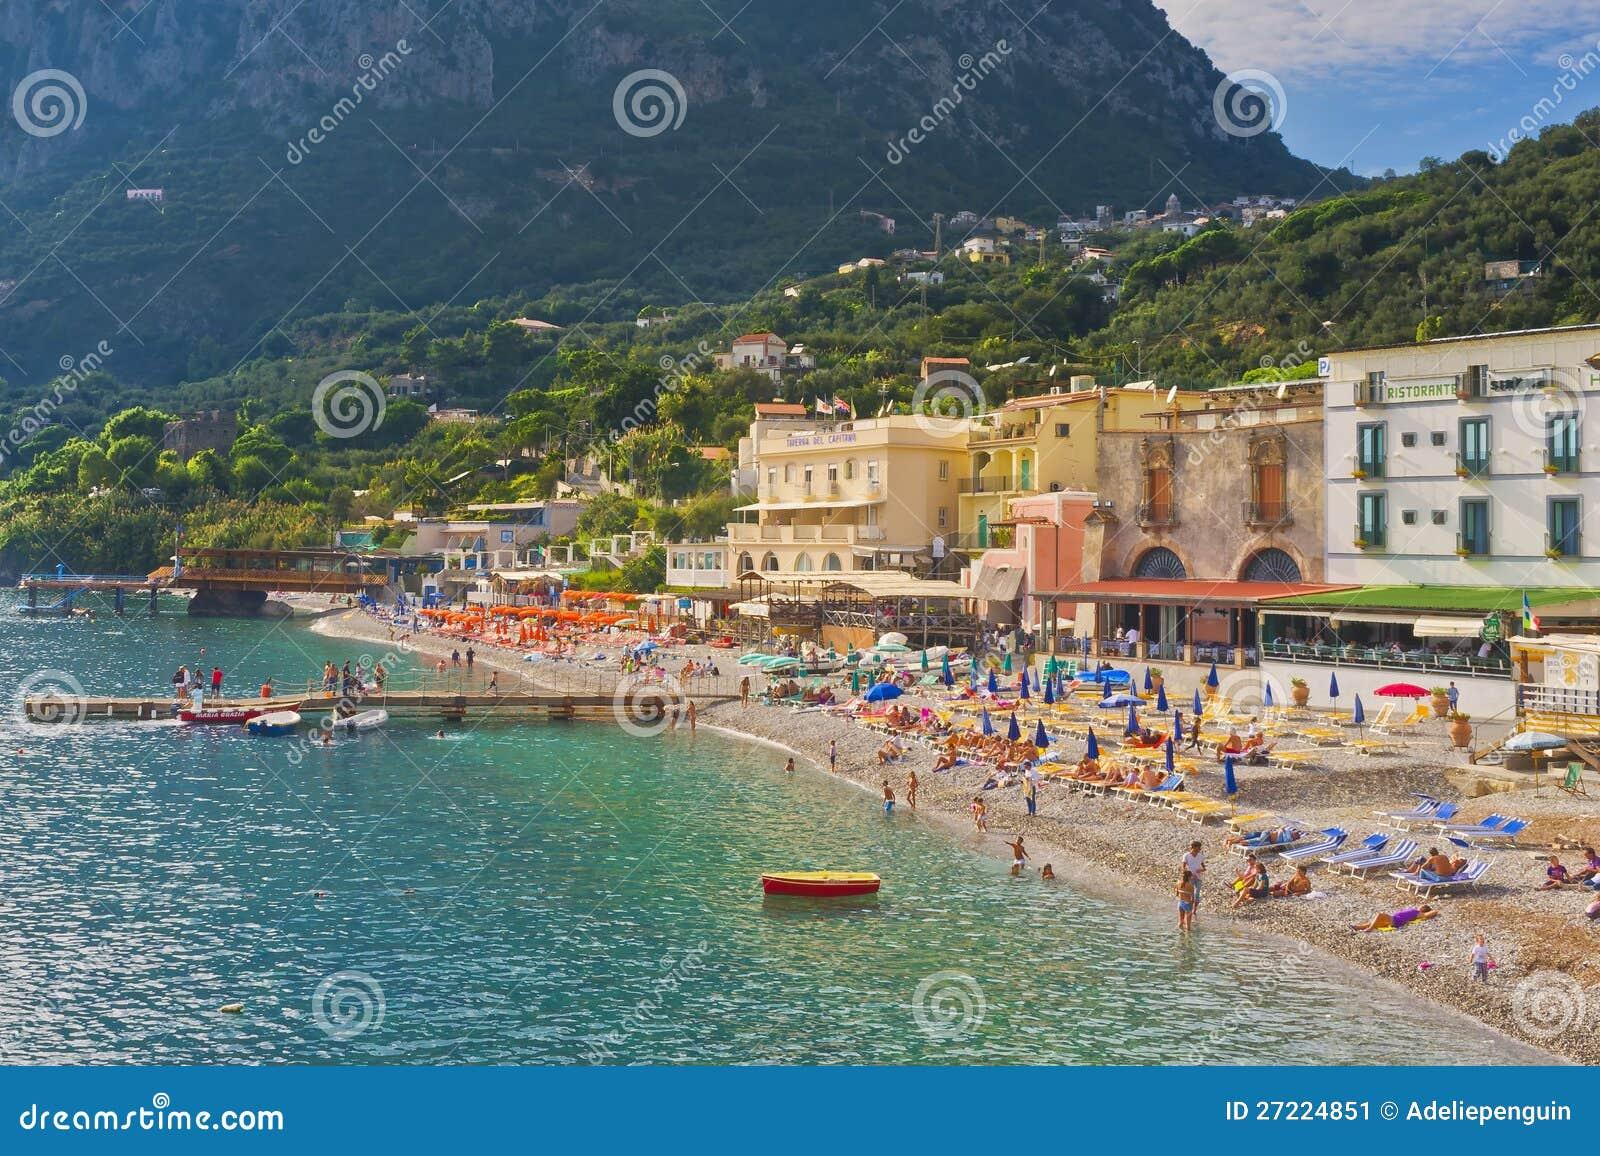 Beach Amalfi Coast Italy Editorial Photo Image Of Amalfi